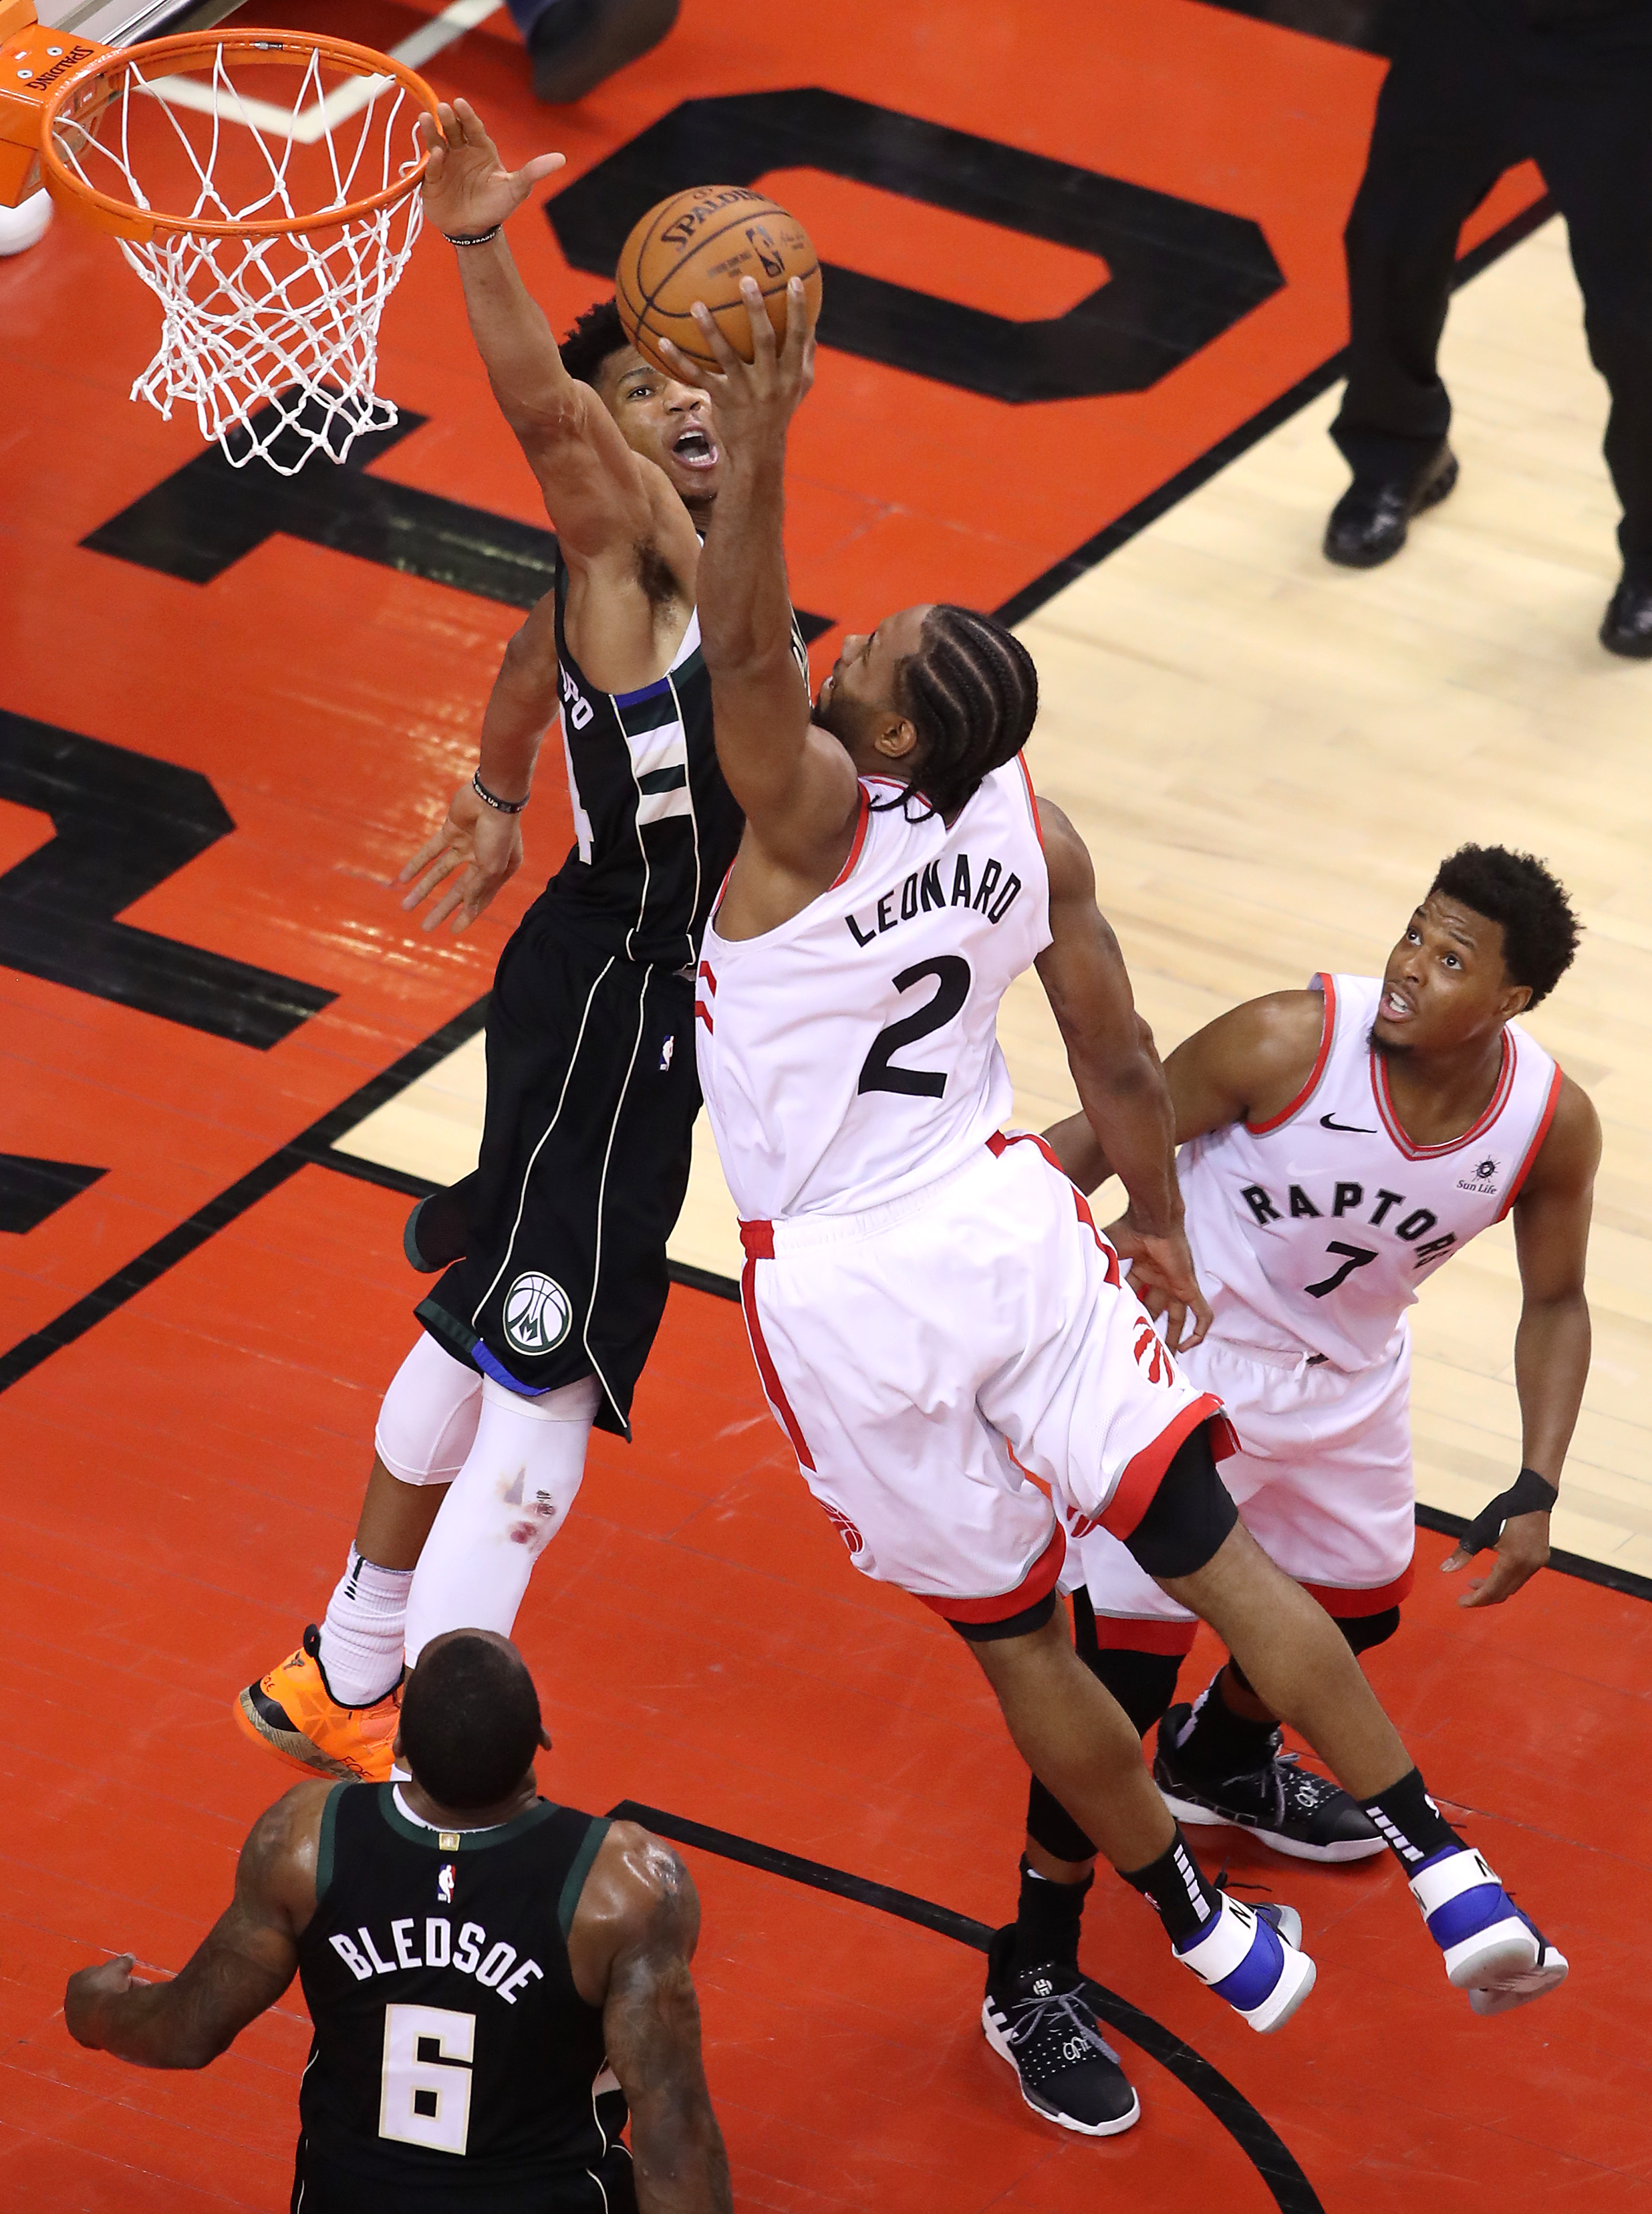 Kawhi Leonard vs. Giannis Antetokonmpo at the rim was basketball nirvana